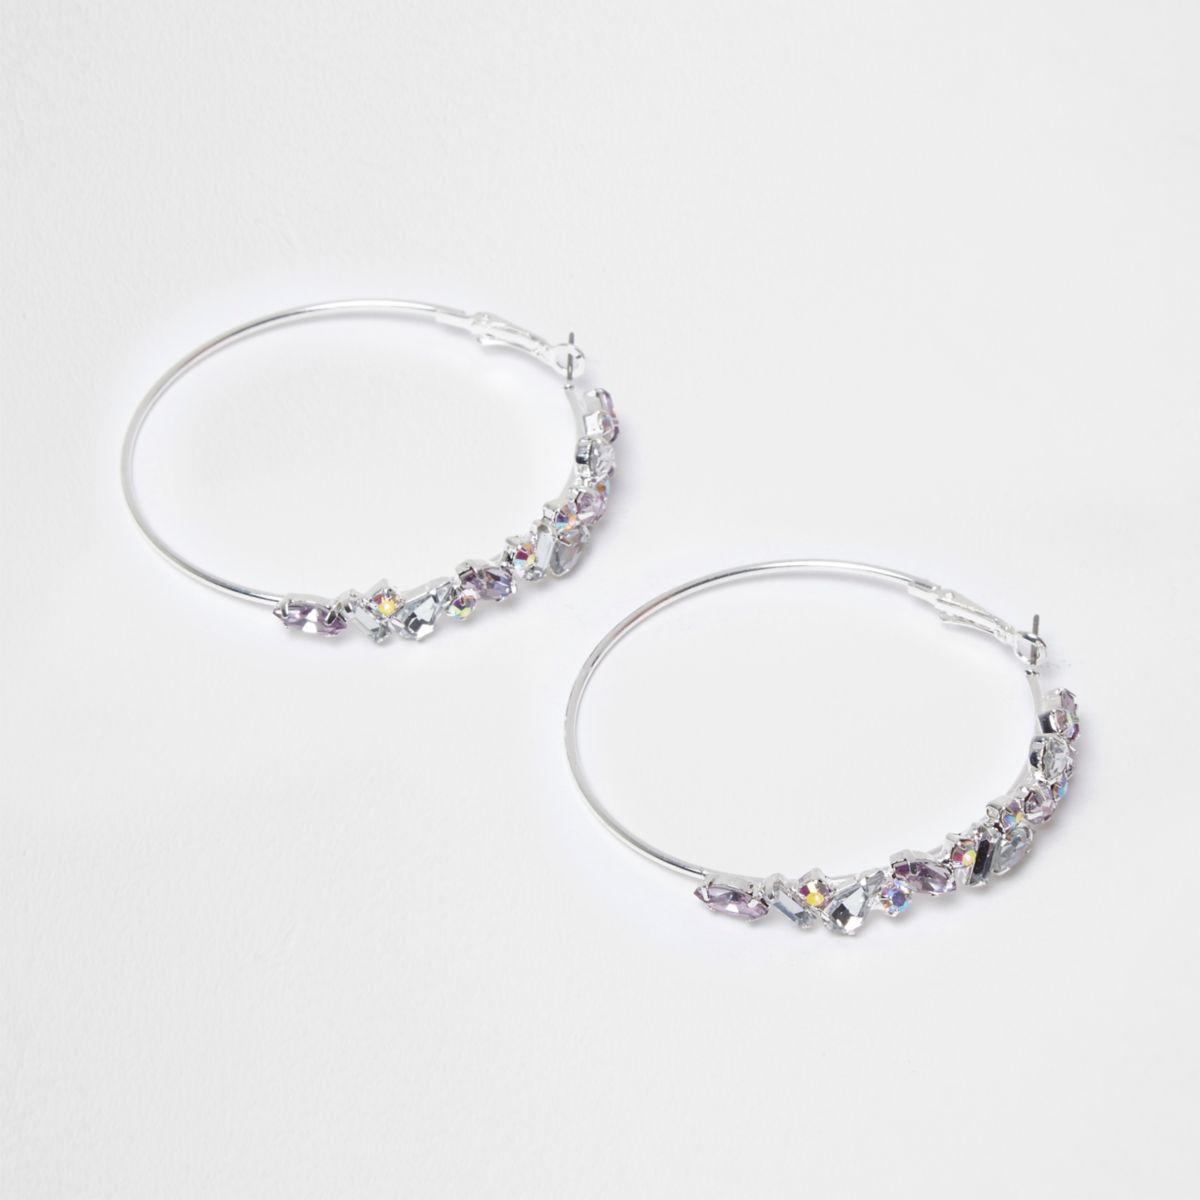 Silver tone jewel hoop earrings